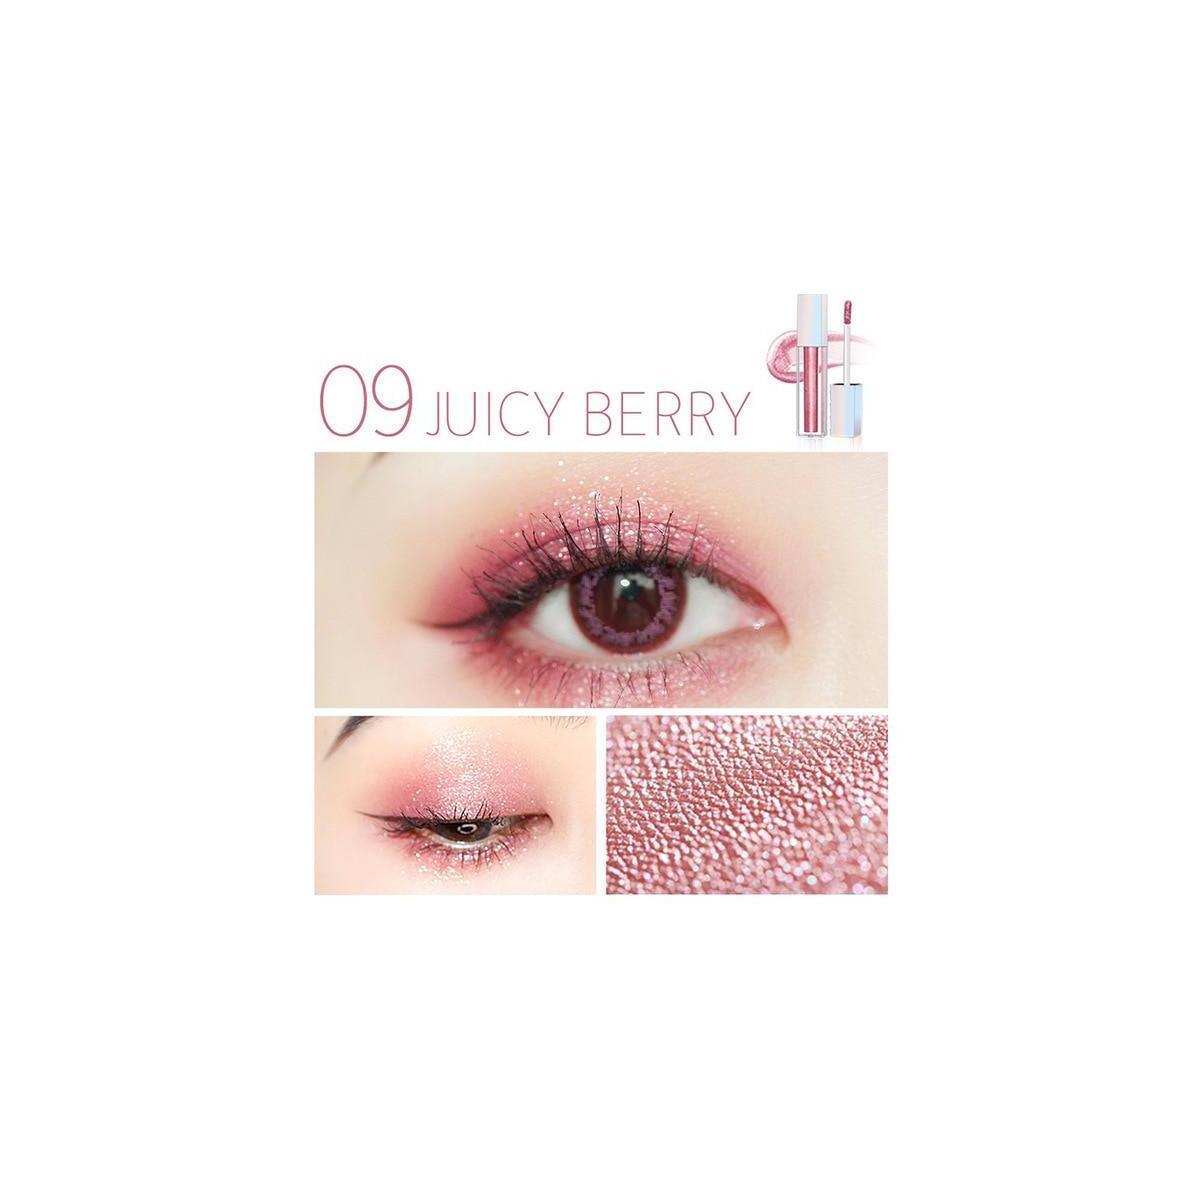 ZEESEA New Liquid Shimmer EyeShadow, 09 Juicy Berry